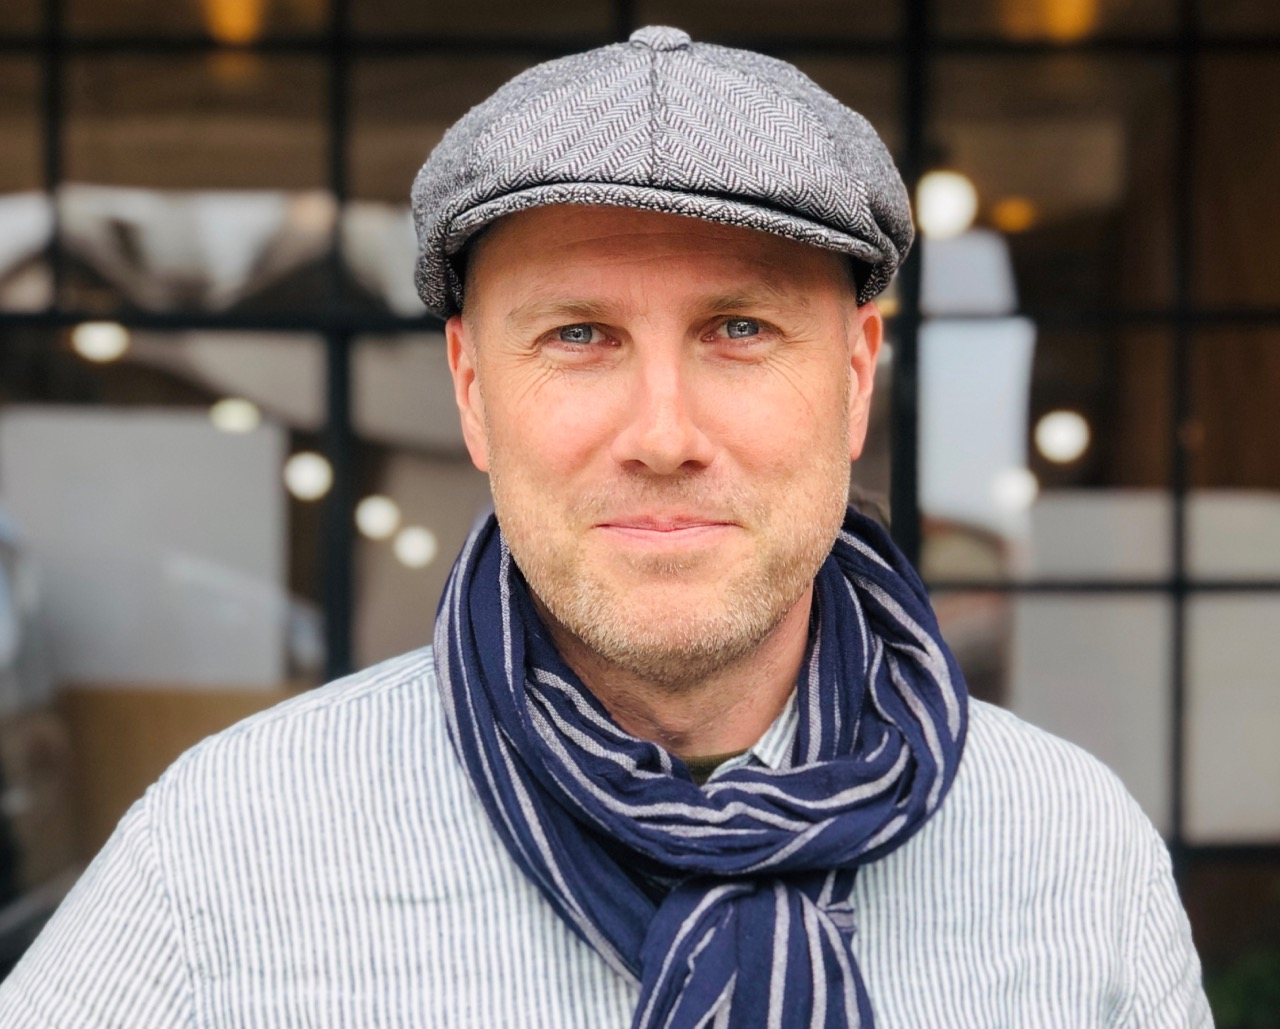 Wrestler snares former Resn Amsterdam CD Kris Hermansson for creative director role